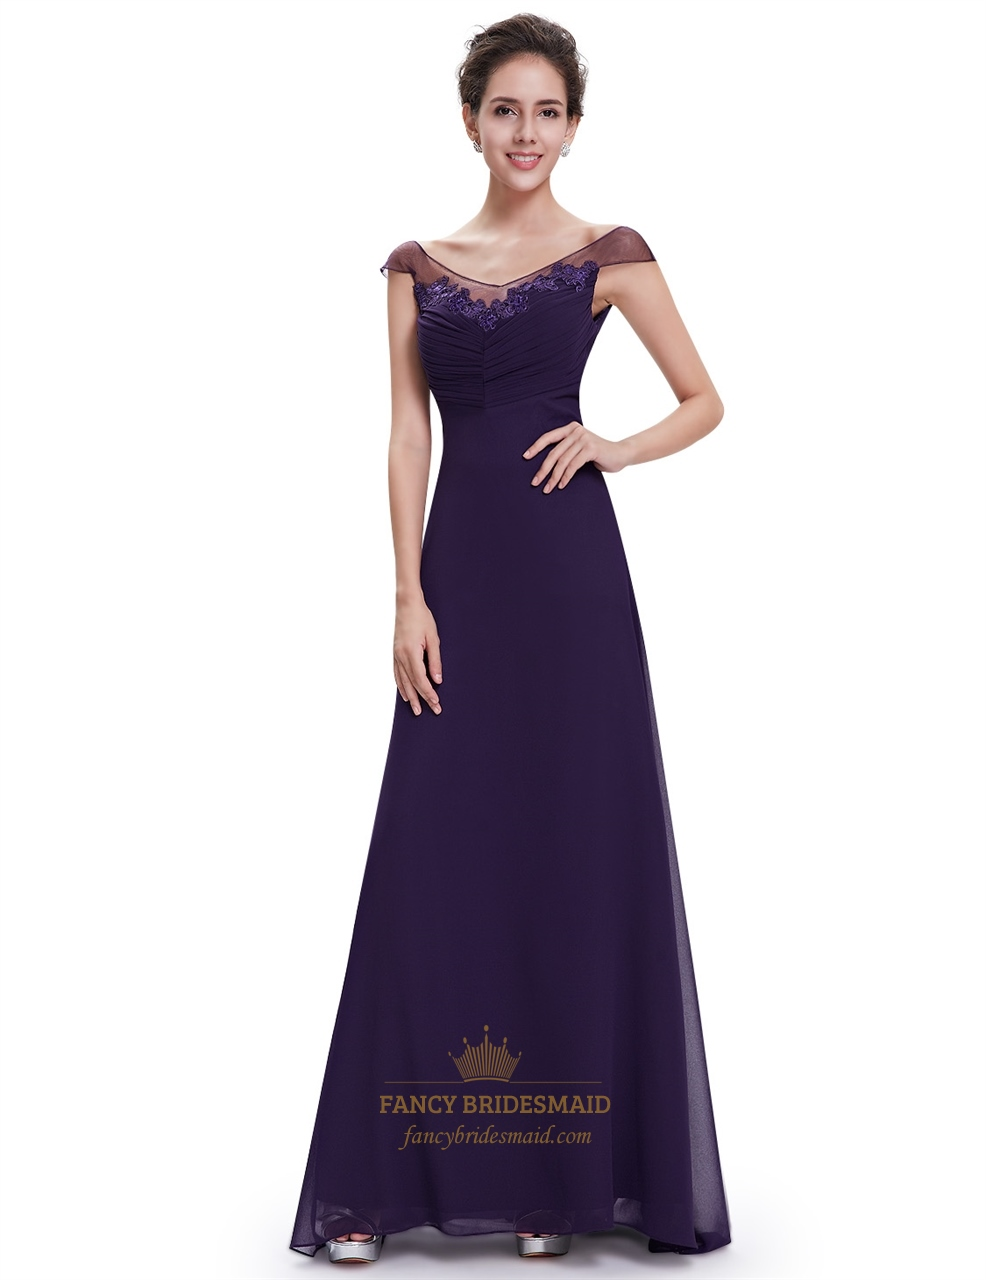 purple chiffon v neck cap sleeves bridesmaid dresses with